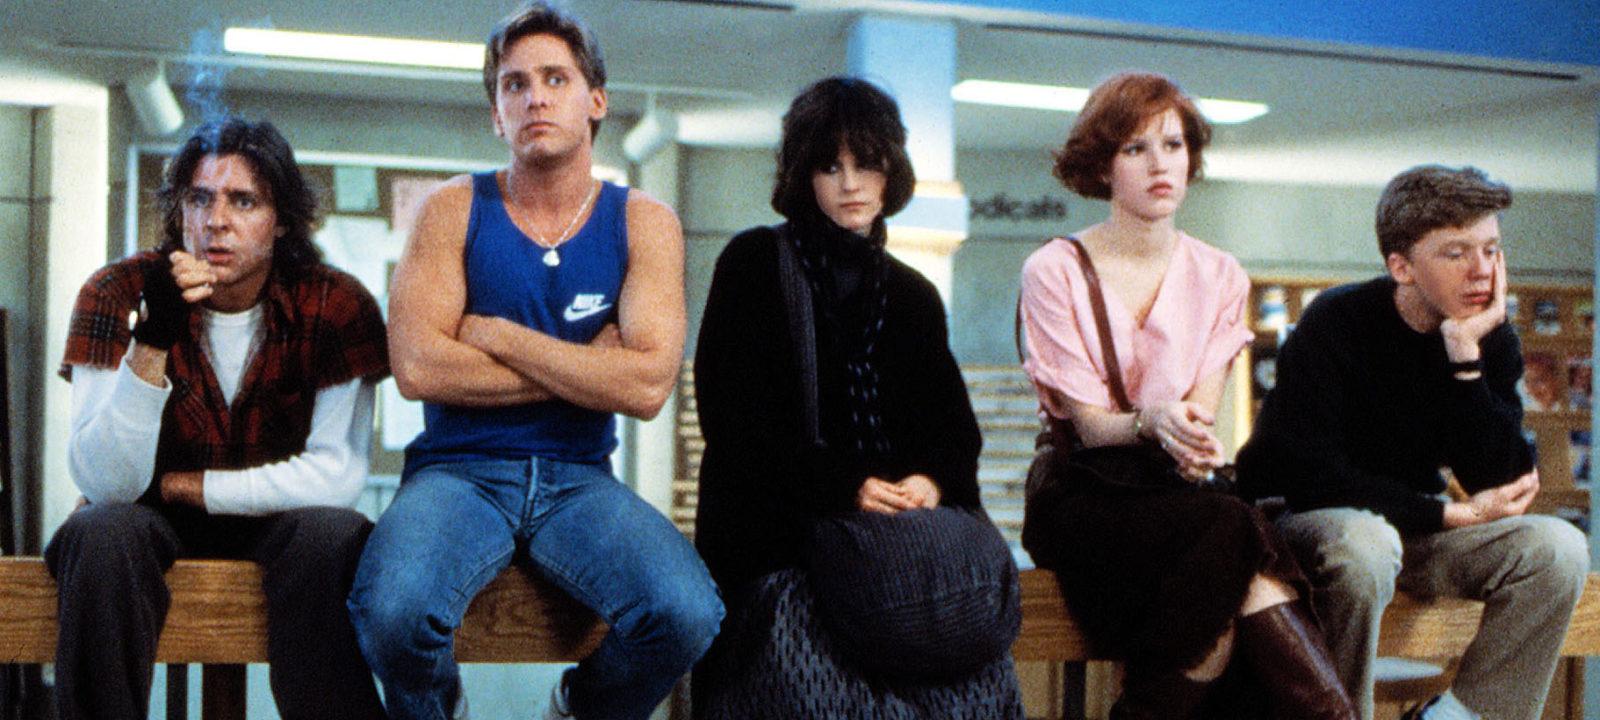 THE BREAKFAST CLUB, Judd Nelson, Emilio Estevez, Ally Sheedy, Molly Ringwald, Anthony Michael Hall, 1985.